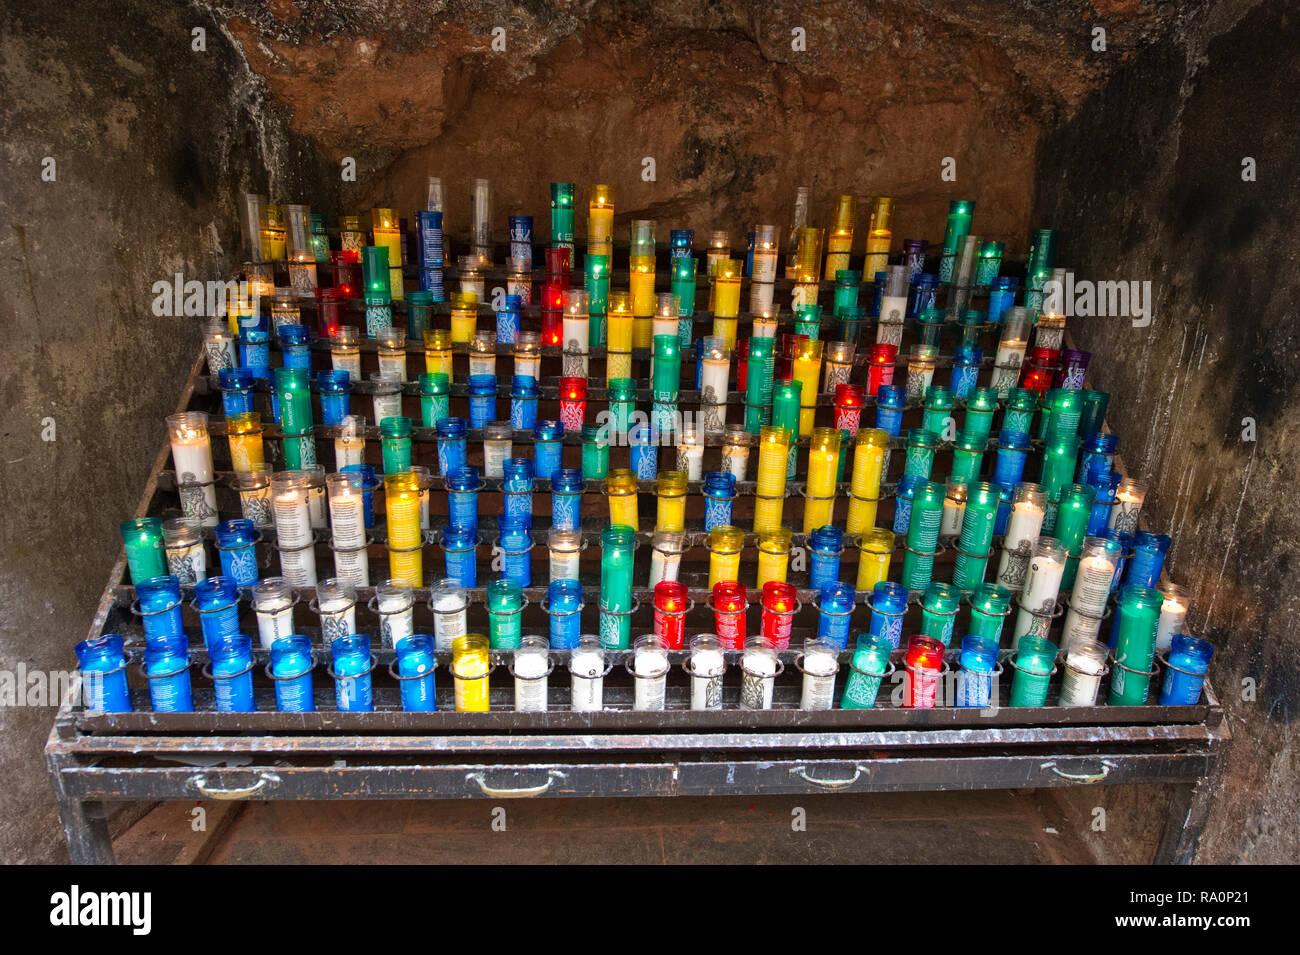 Bunte Gebet Kerzen an das Kloster Montserrat, Montserrat, Barcelona, Spanien Stockbild